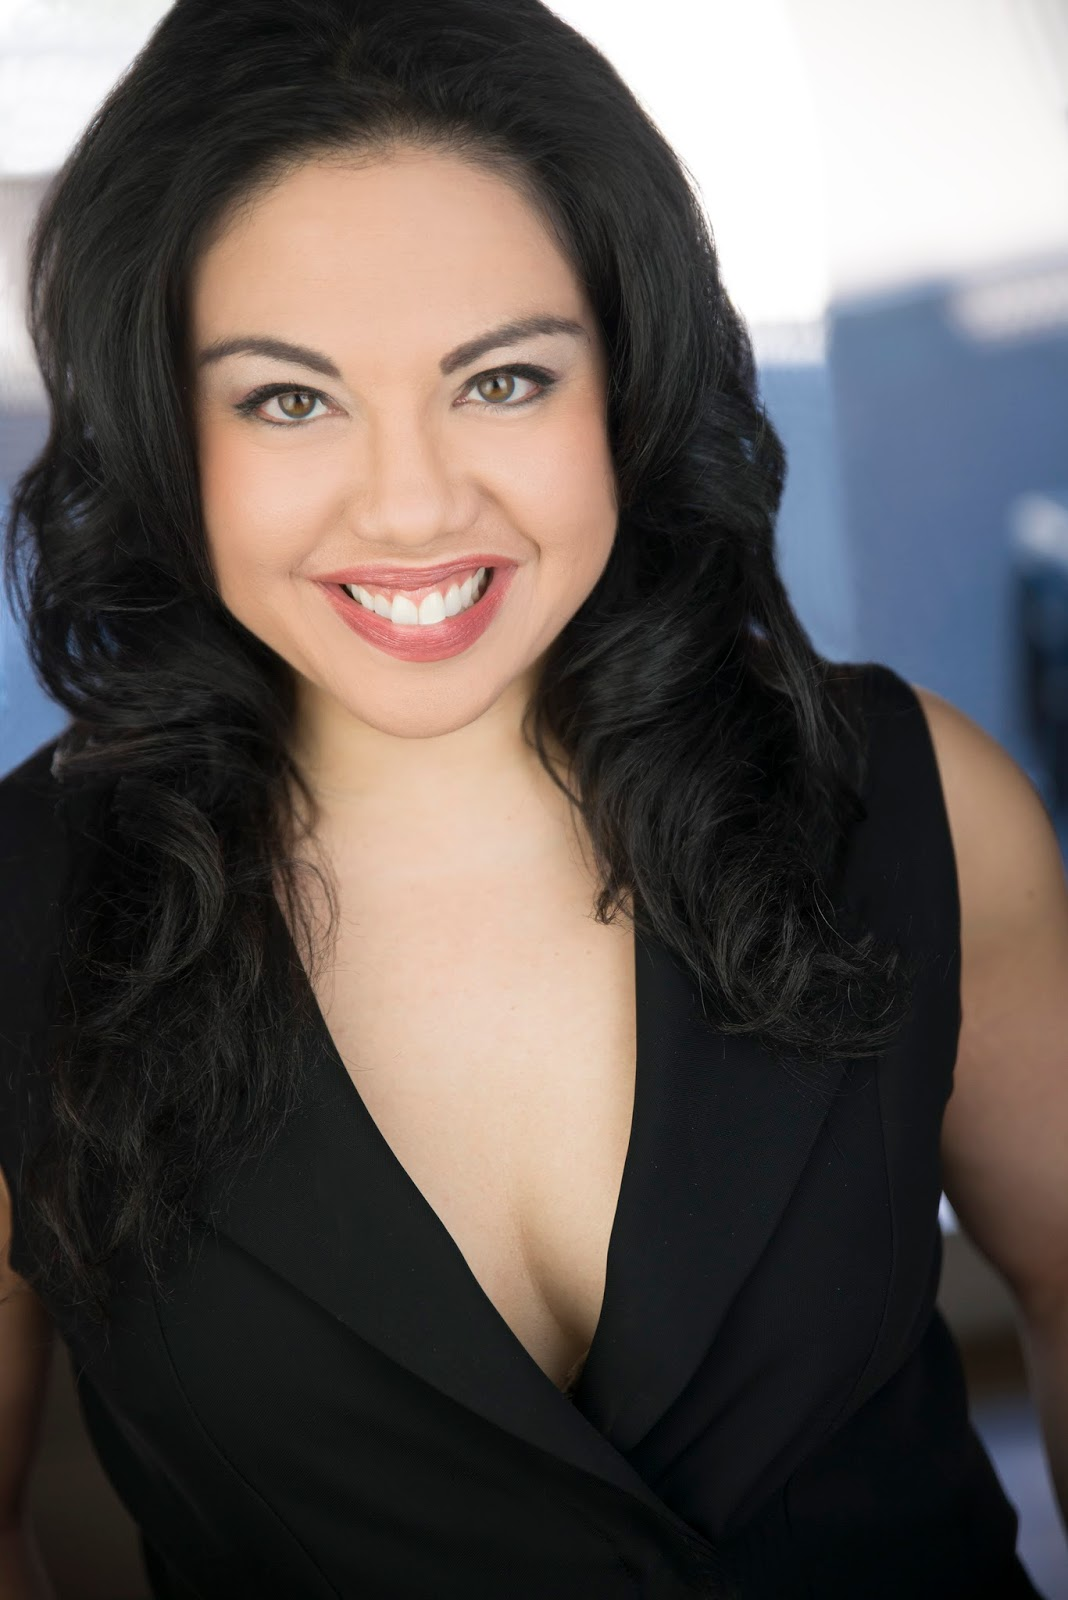 Maria-Christina OliverasBroadway Best Vocal Coach Matt Farnsworth Vocal Studio Best Voice Teacher in the World NY MF Voice app Singing